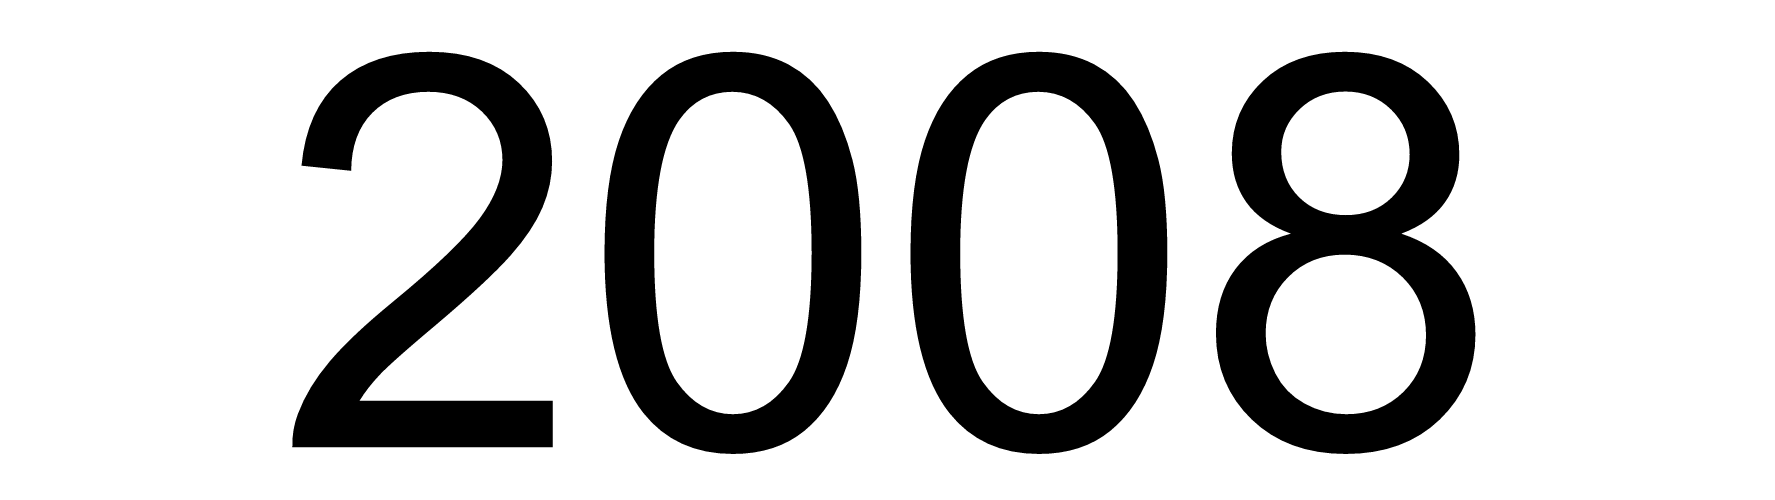 2008-logo-black.png